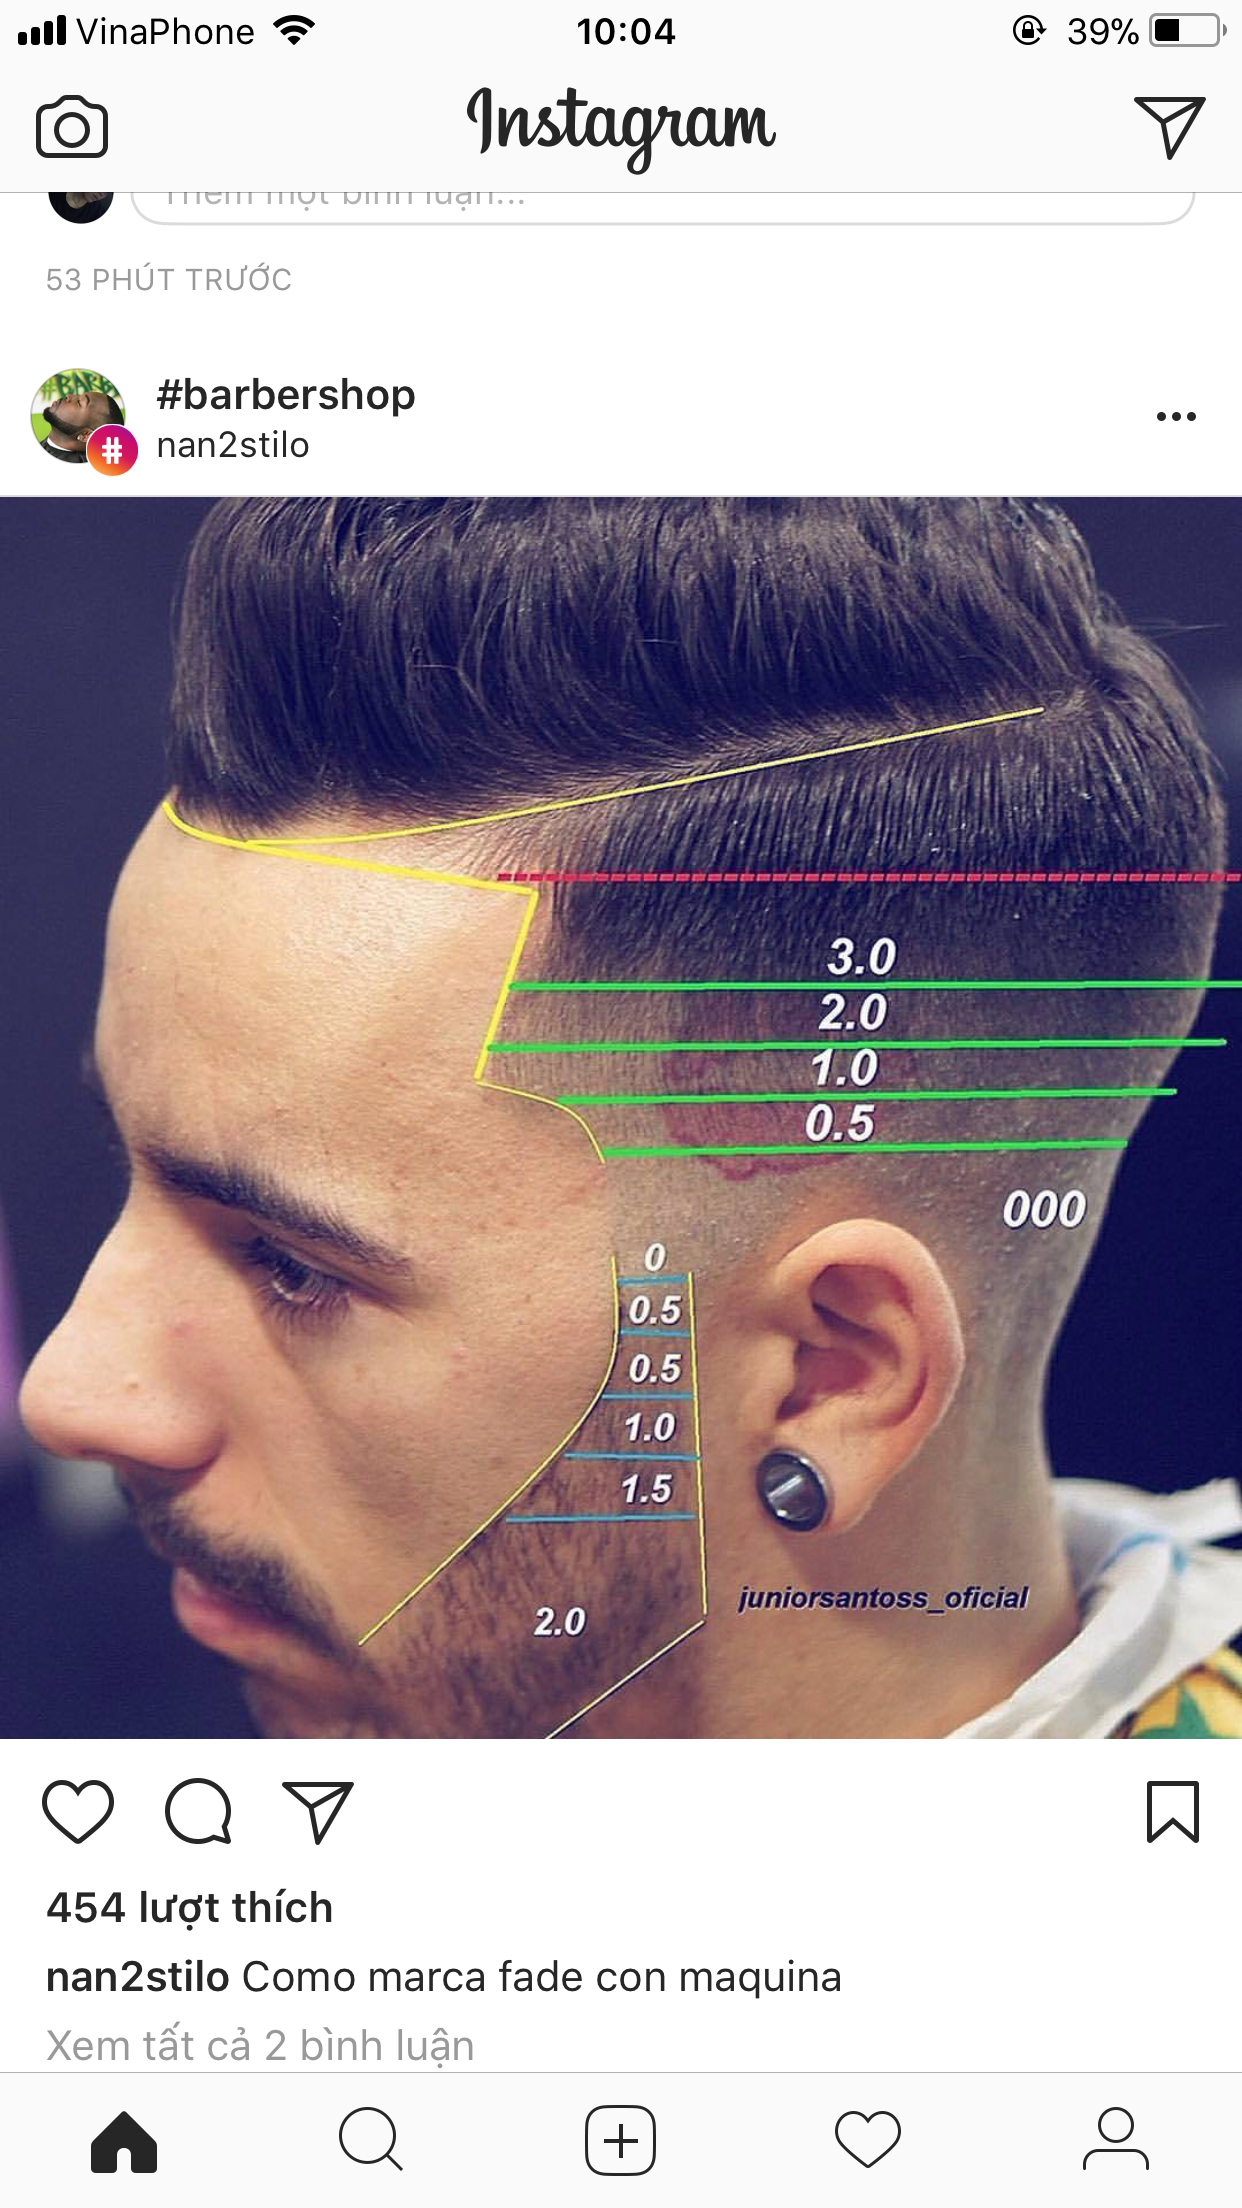 Corte de pelo con la maquina 0